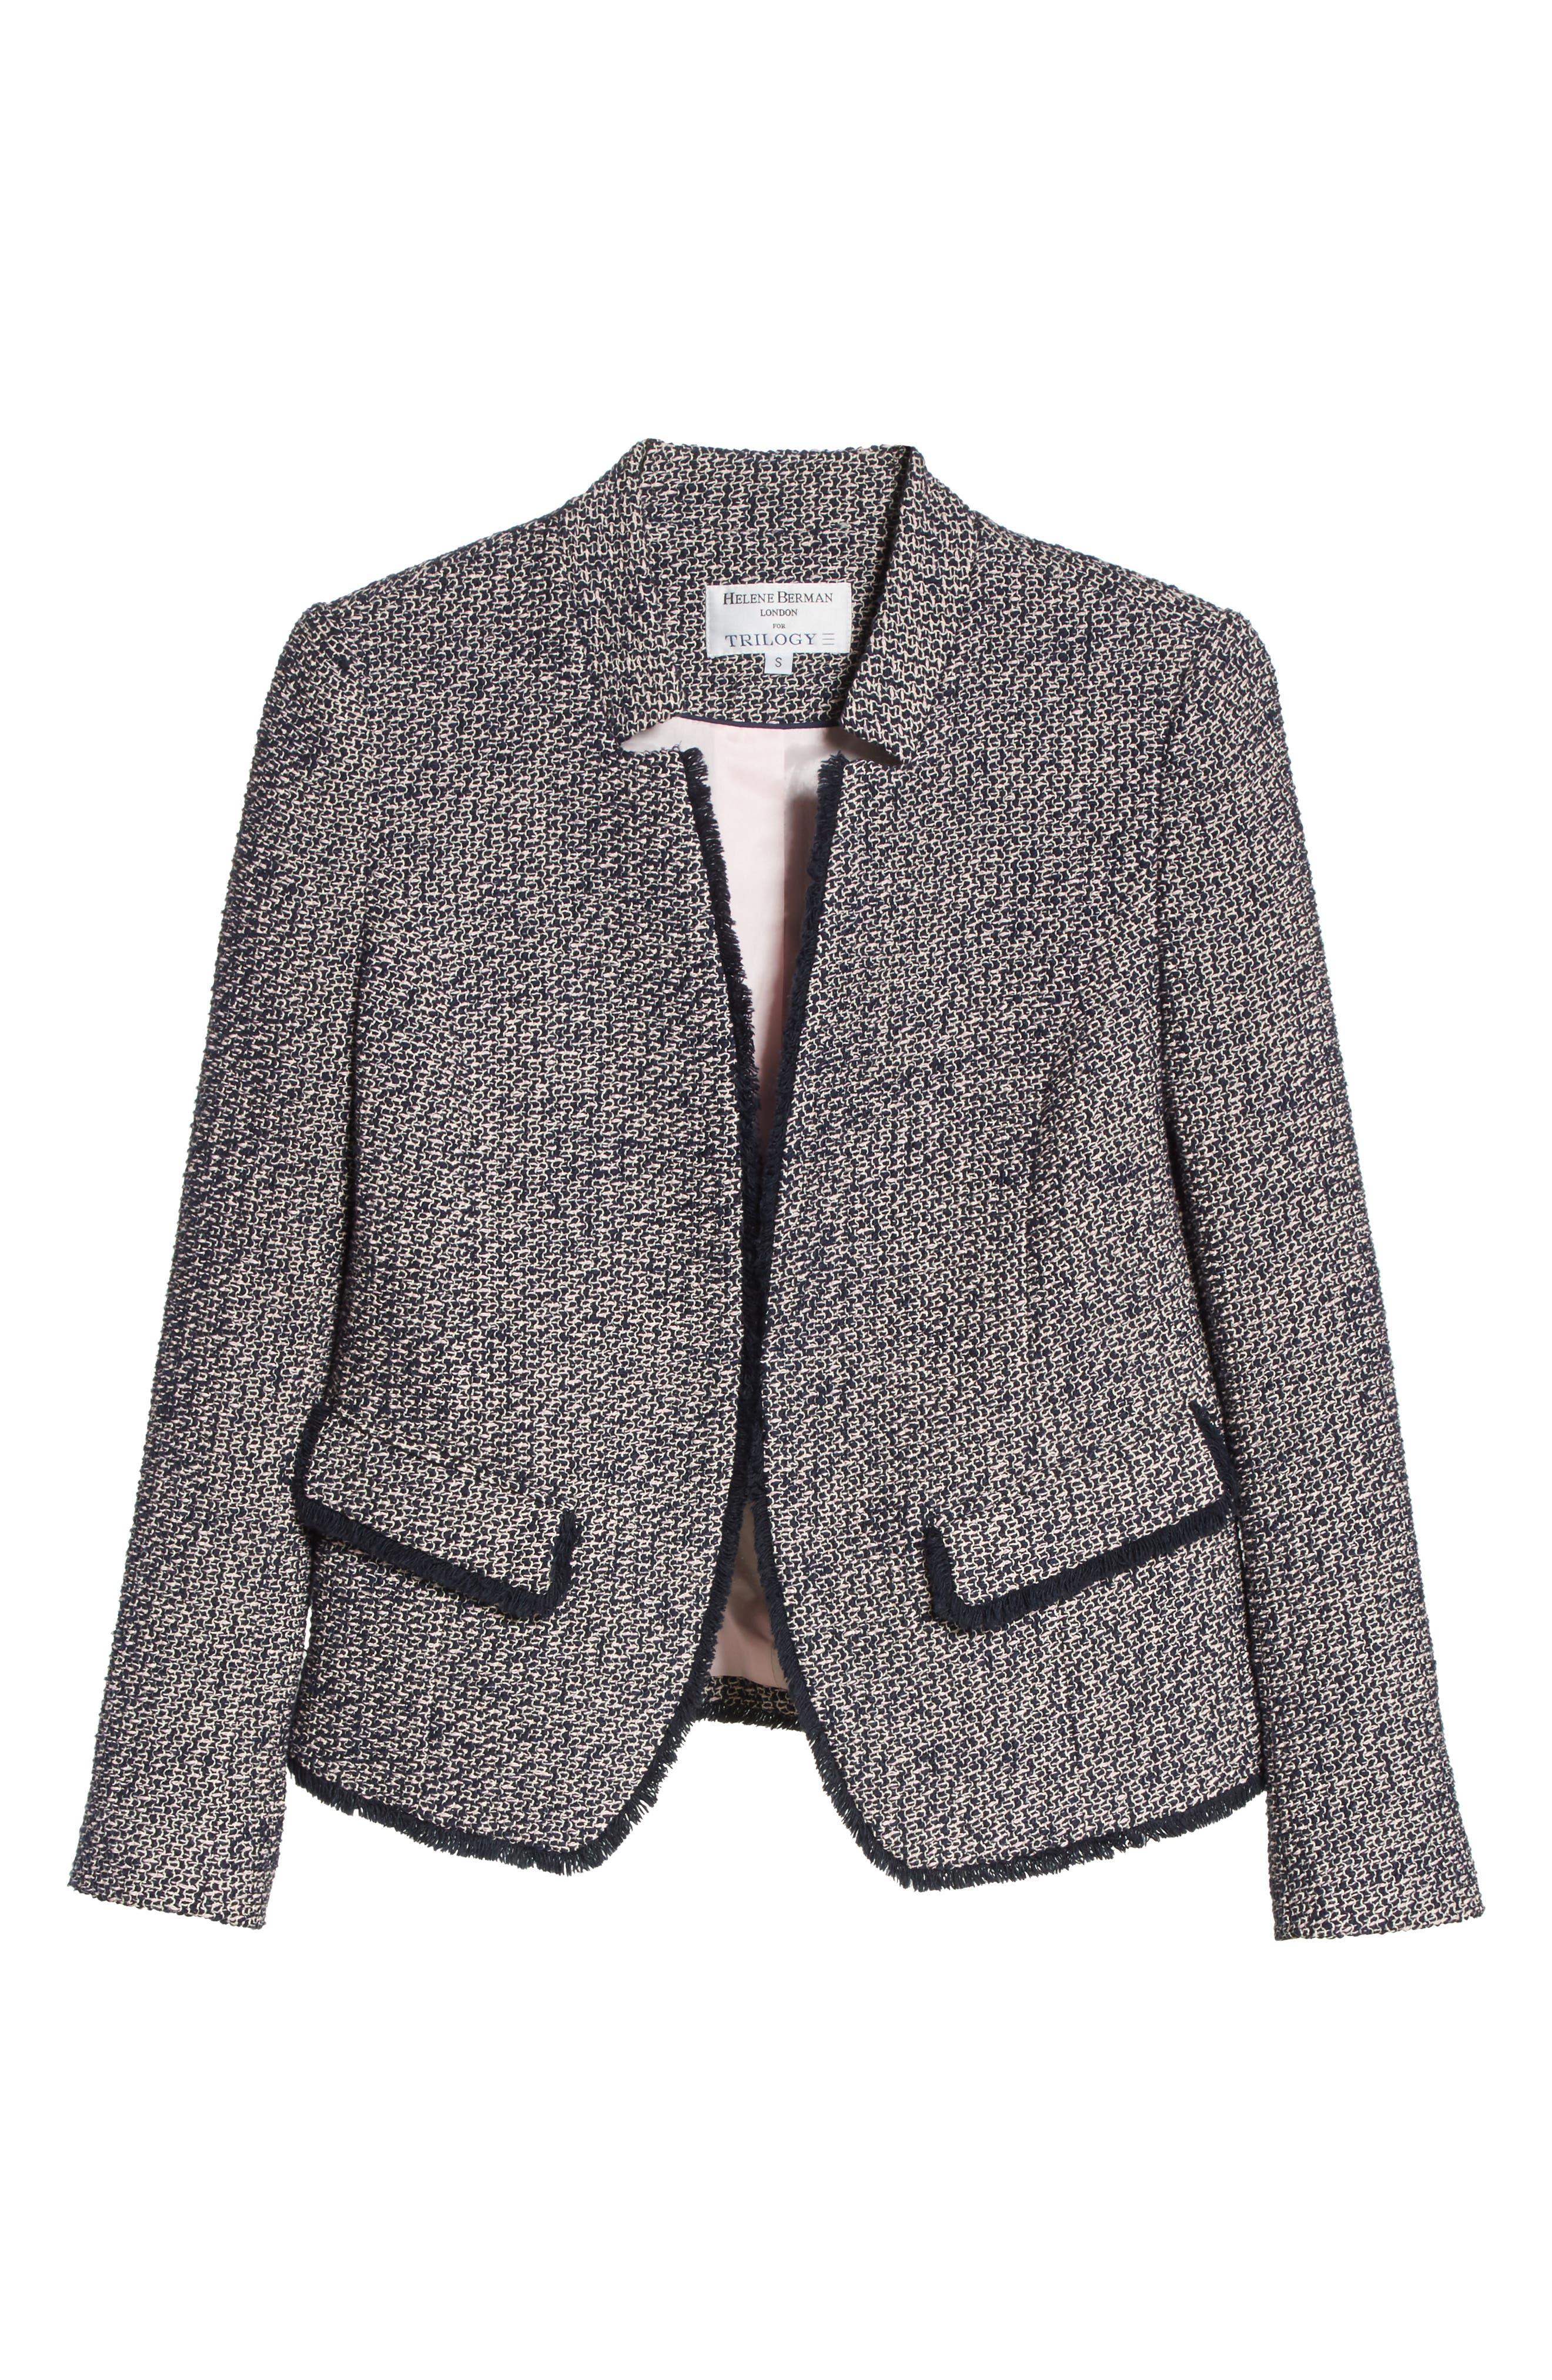 Notch Collar Tweed Jacket,                             Alternate thumbnail 6, color,                             Navy/ Pink